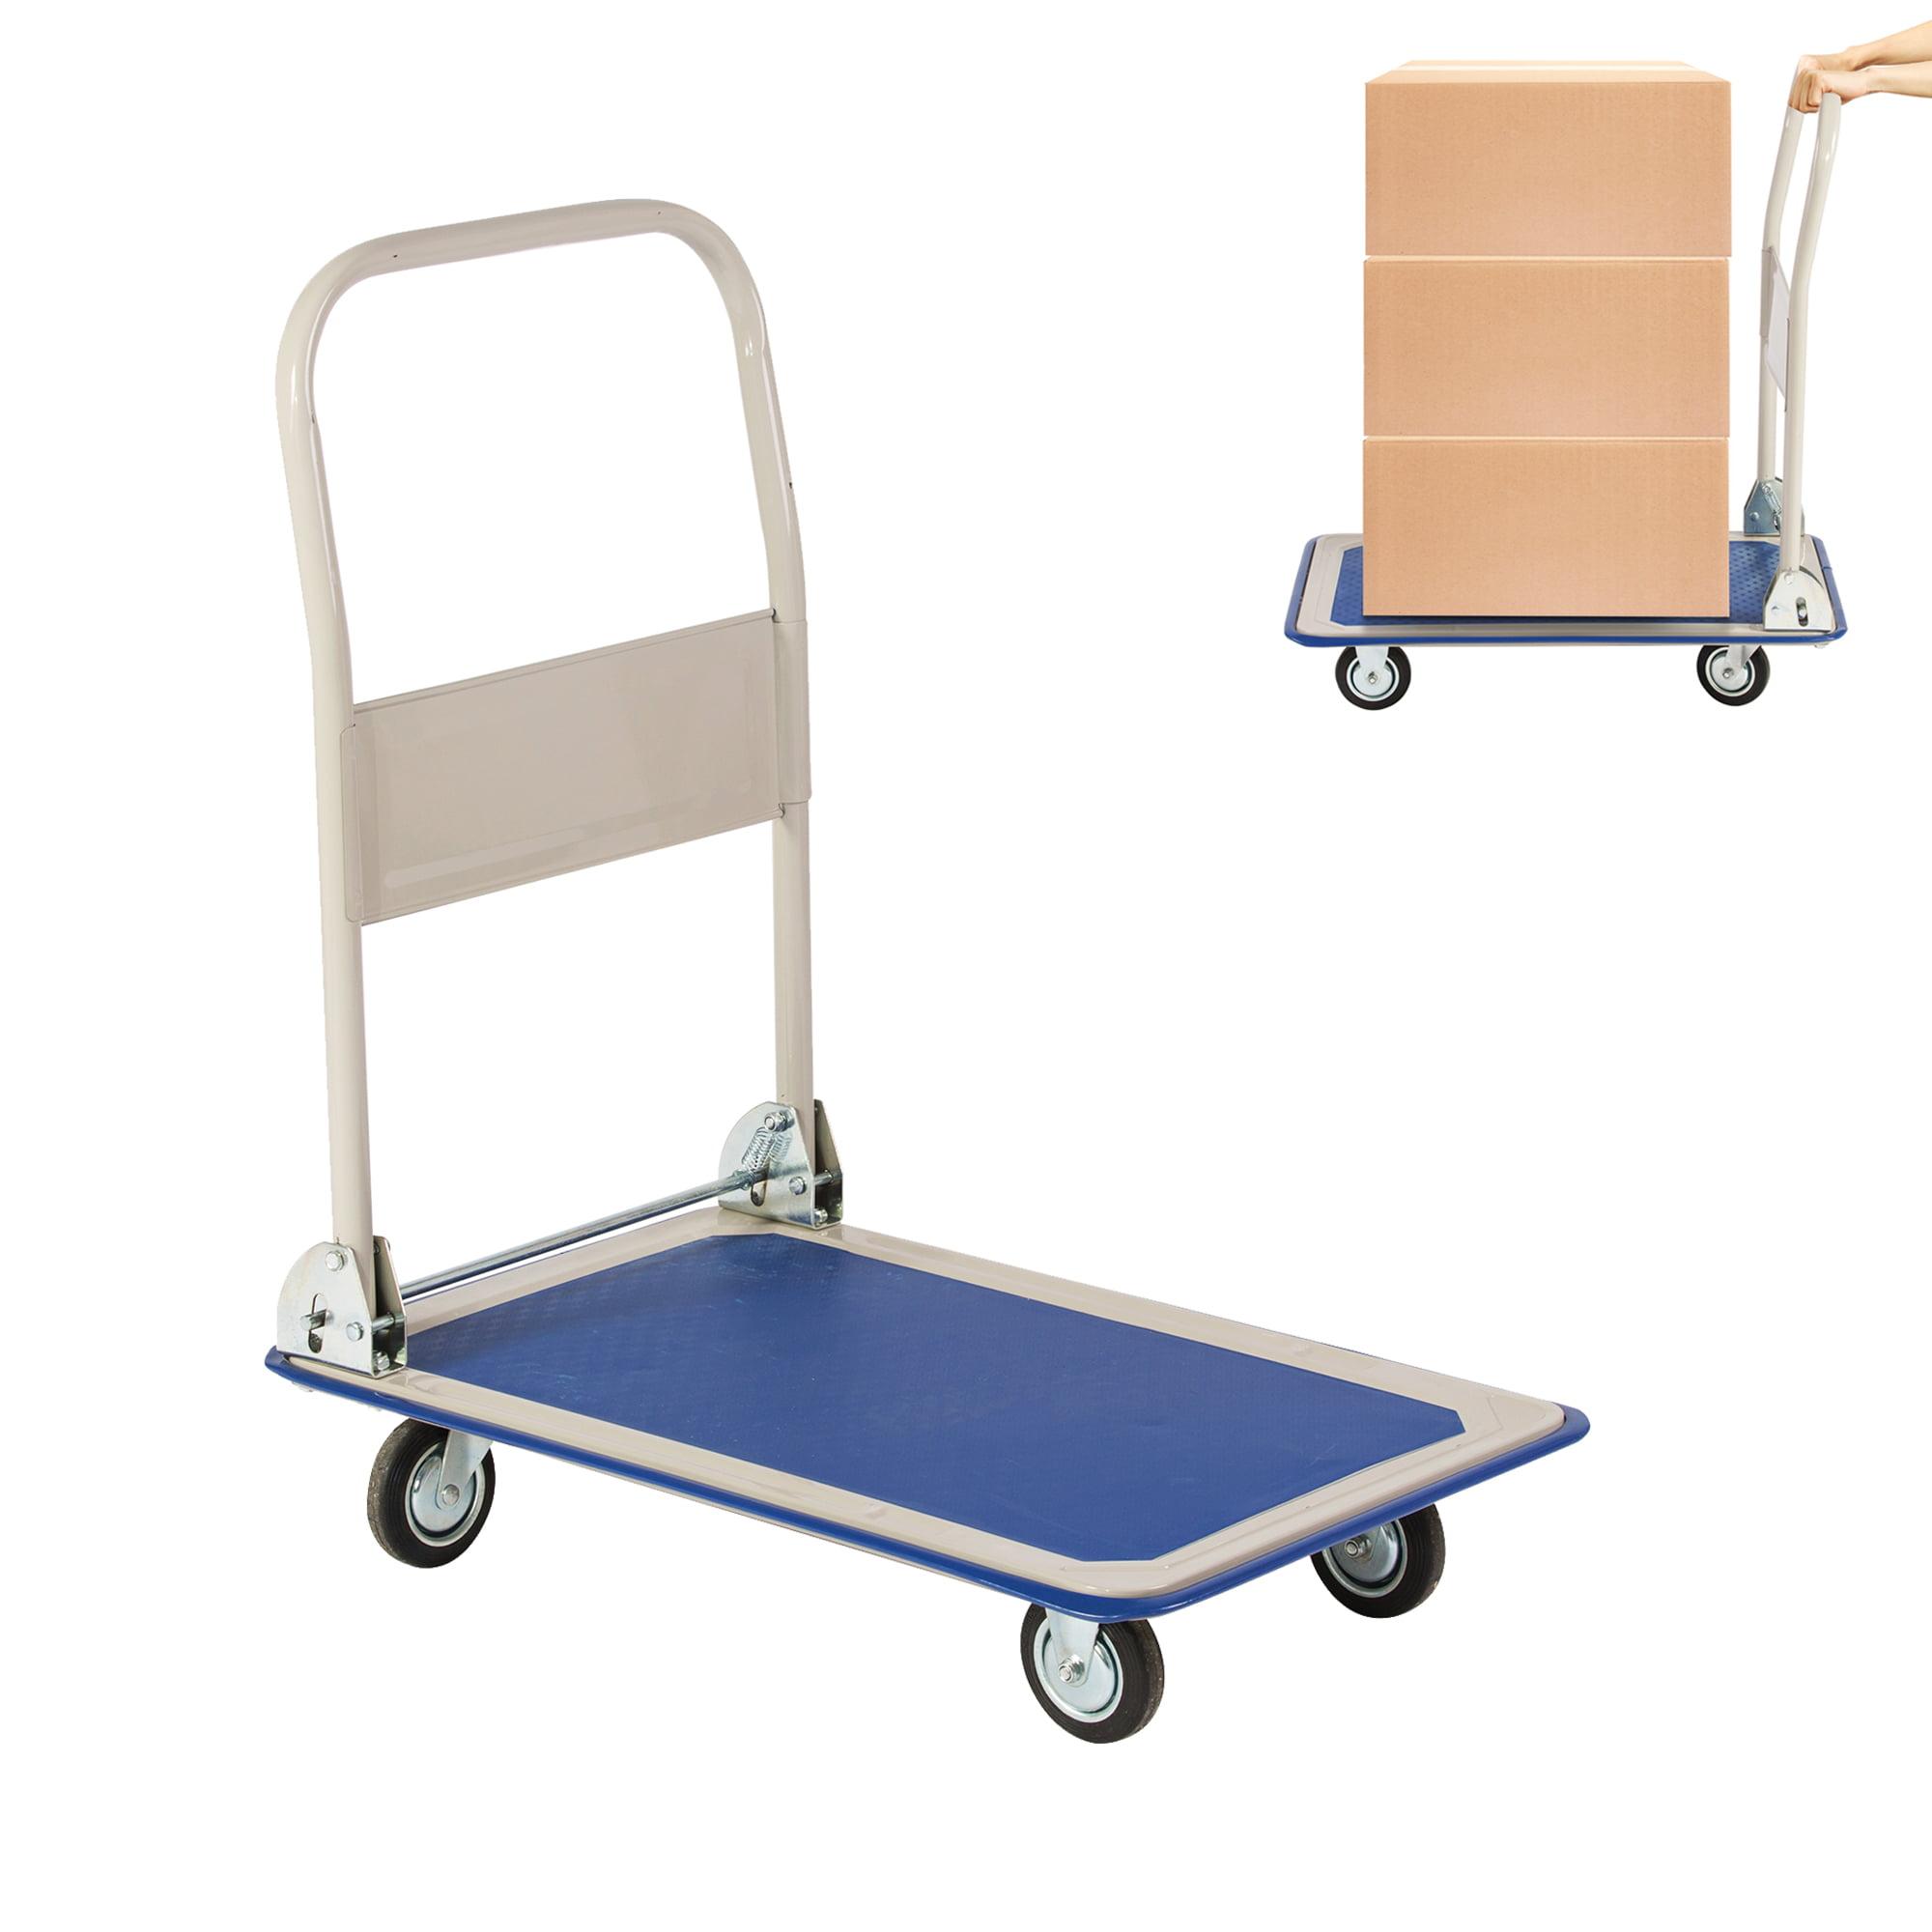 Karmas Product Platform Truck Hand Cart Dolly Folding Moving Push Heavy Duty Rolling Cart With 4 Wheels 330 Lbs Weight Capacity Walmart Com Walmart Com